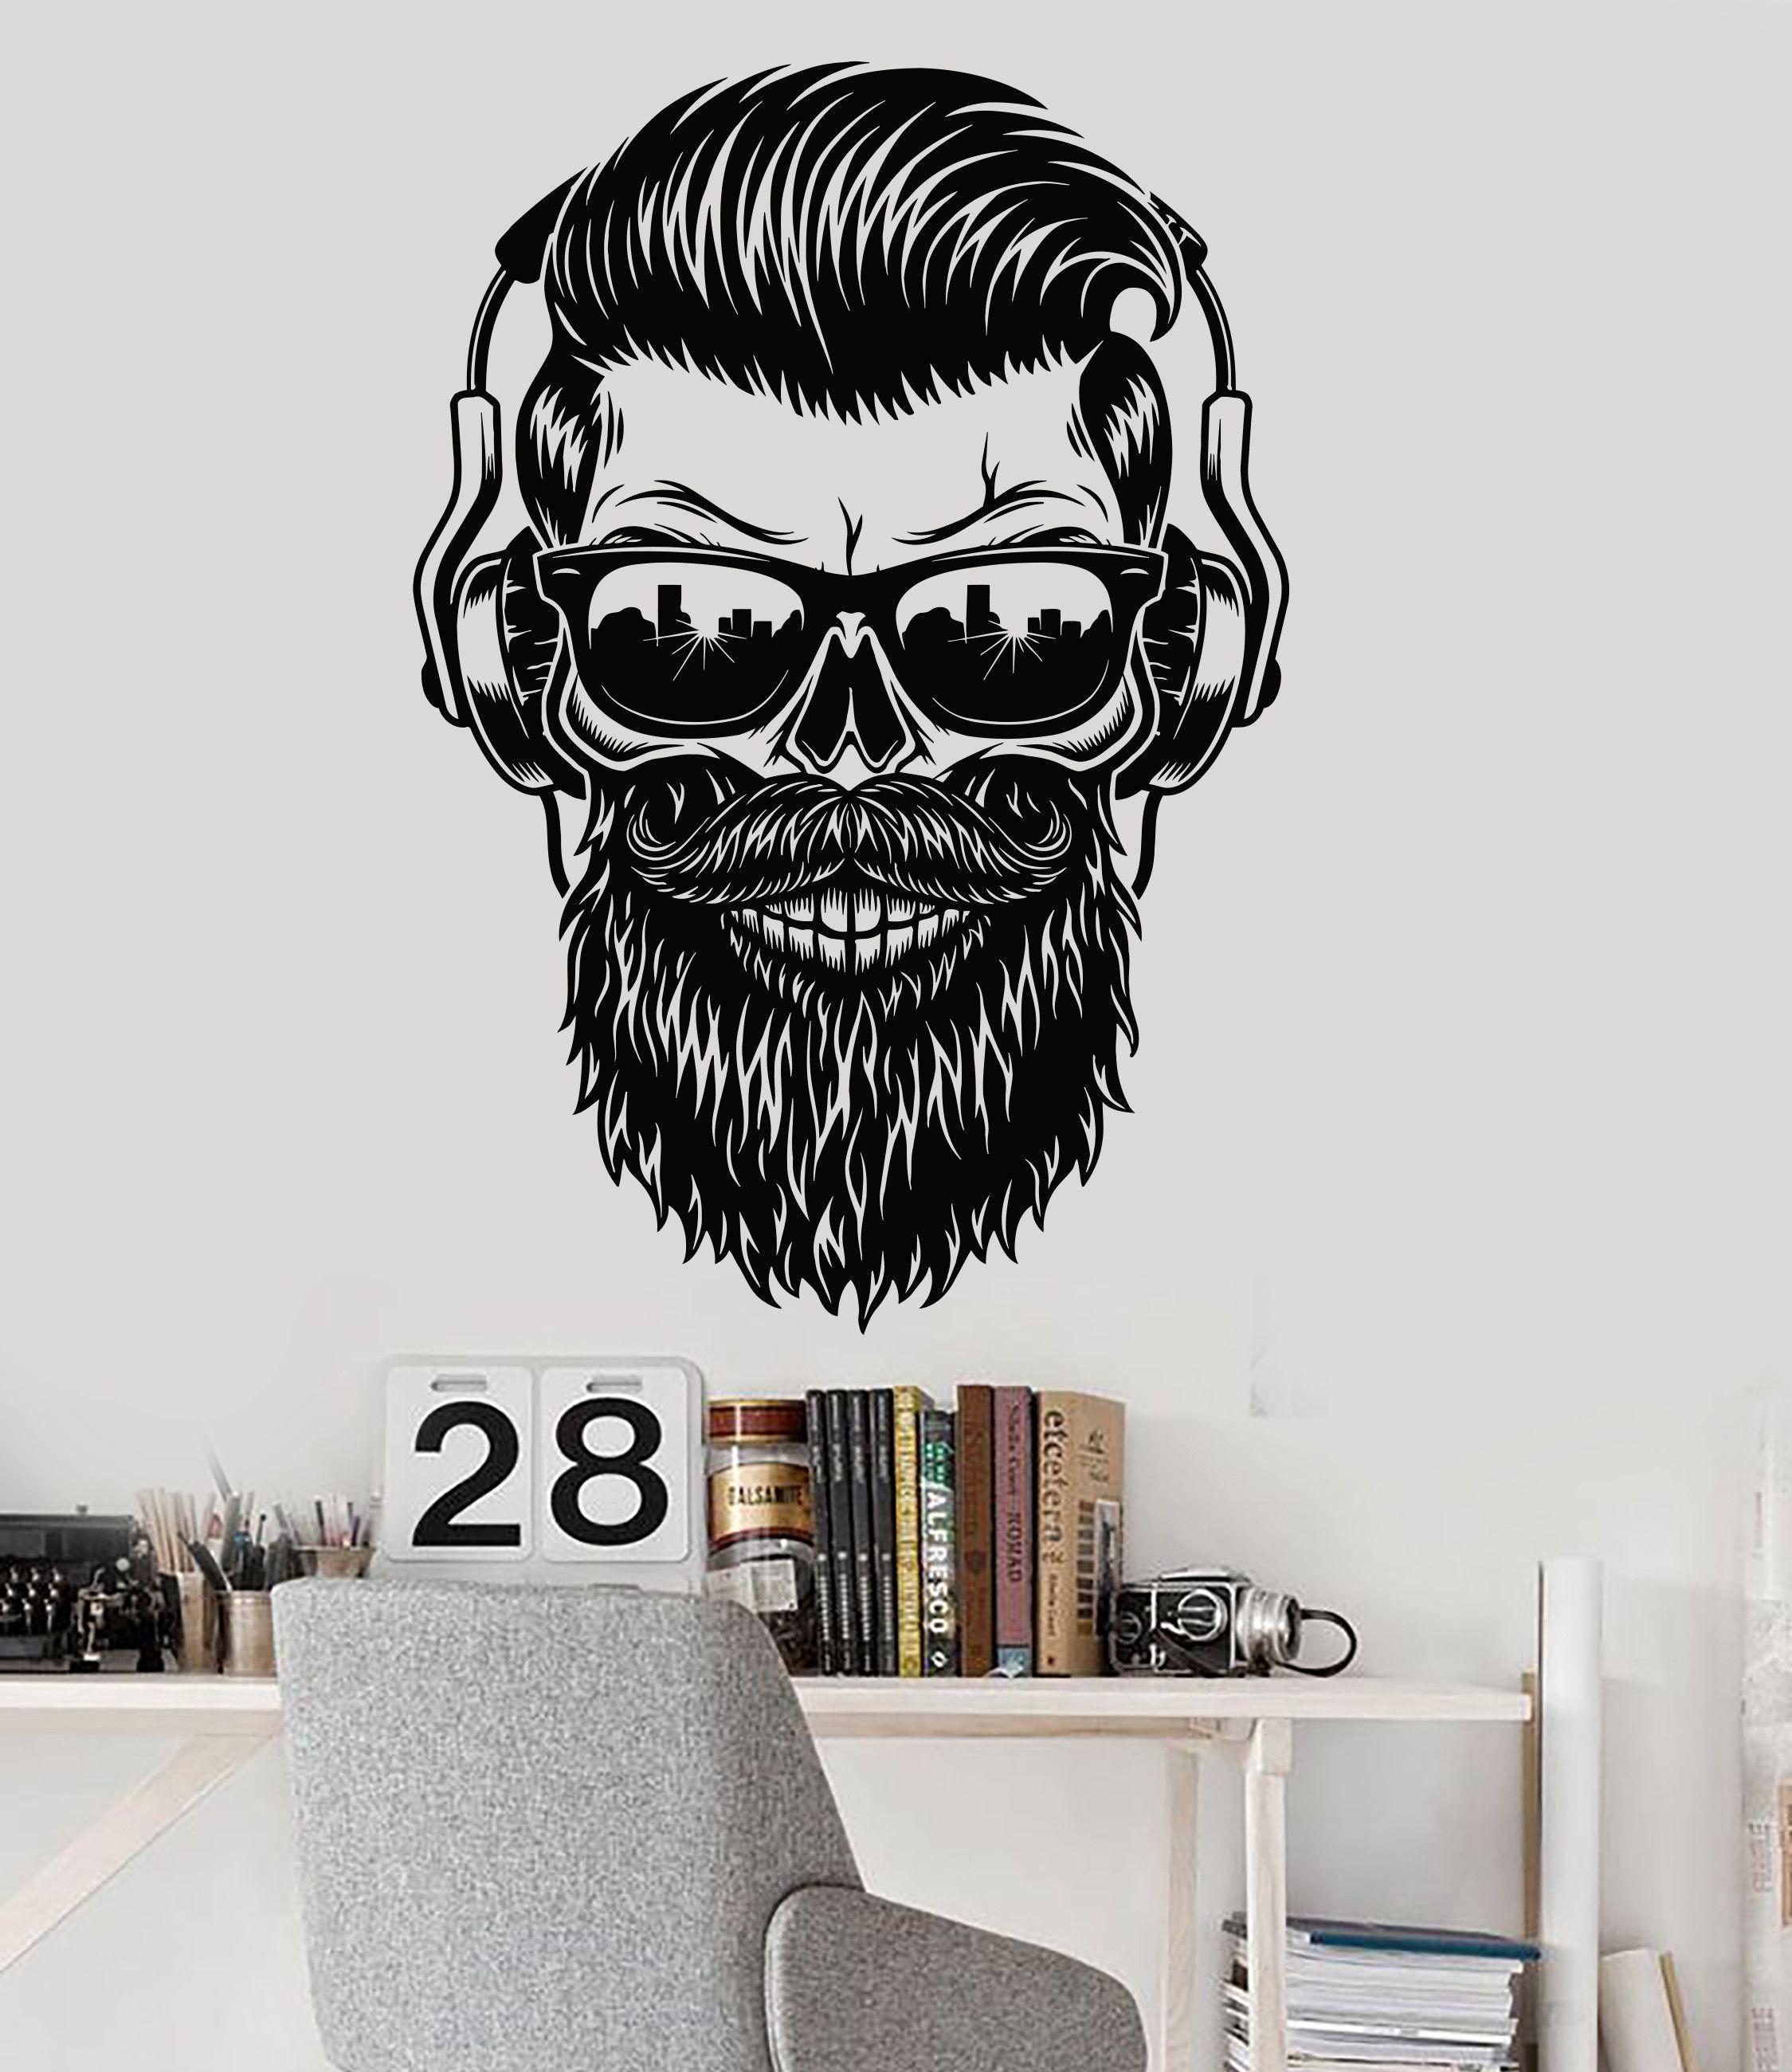 Vinyl wall decal hipster skull sunglasses musical headphones stickers 1447ig vinyl wall decal hipster